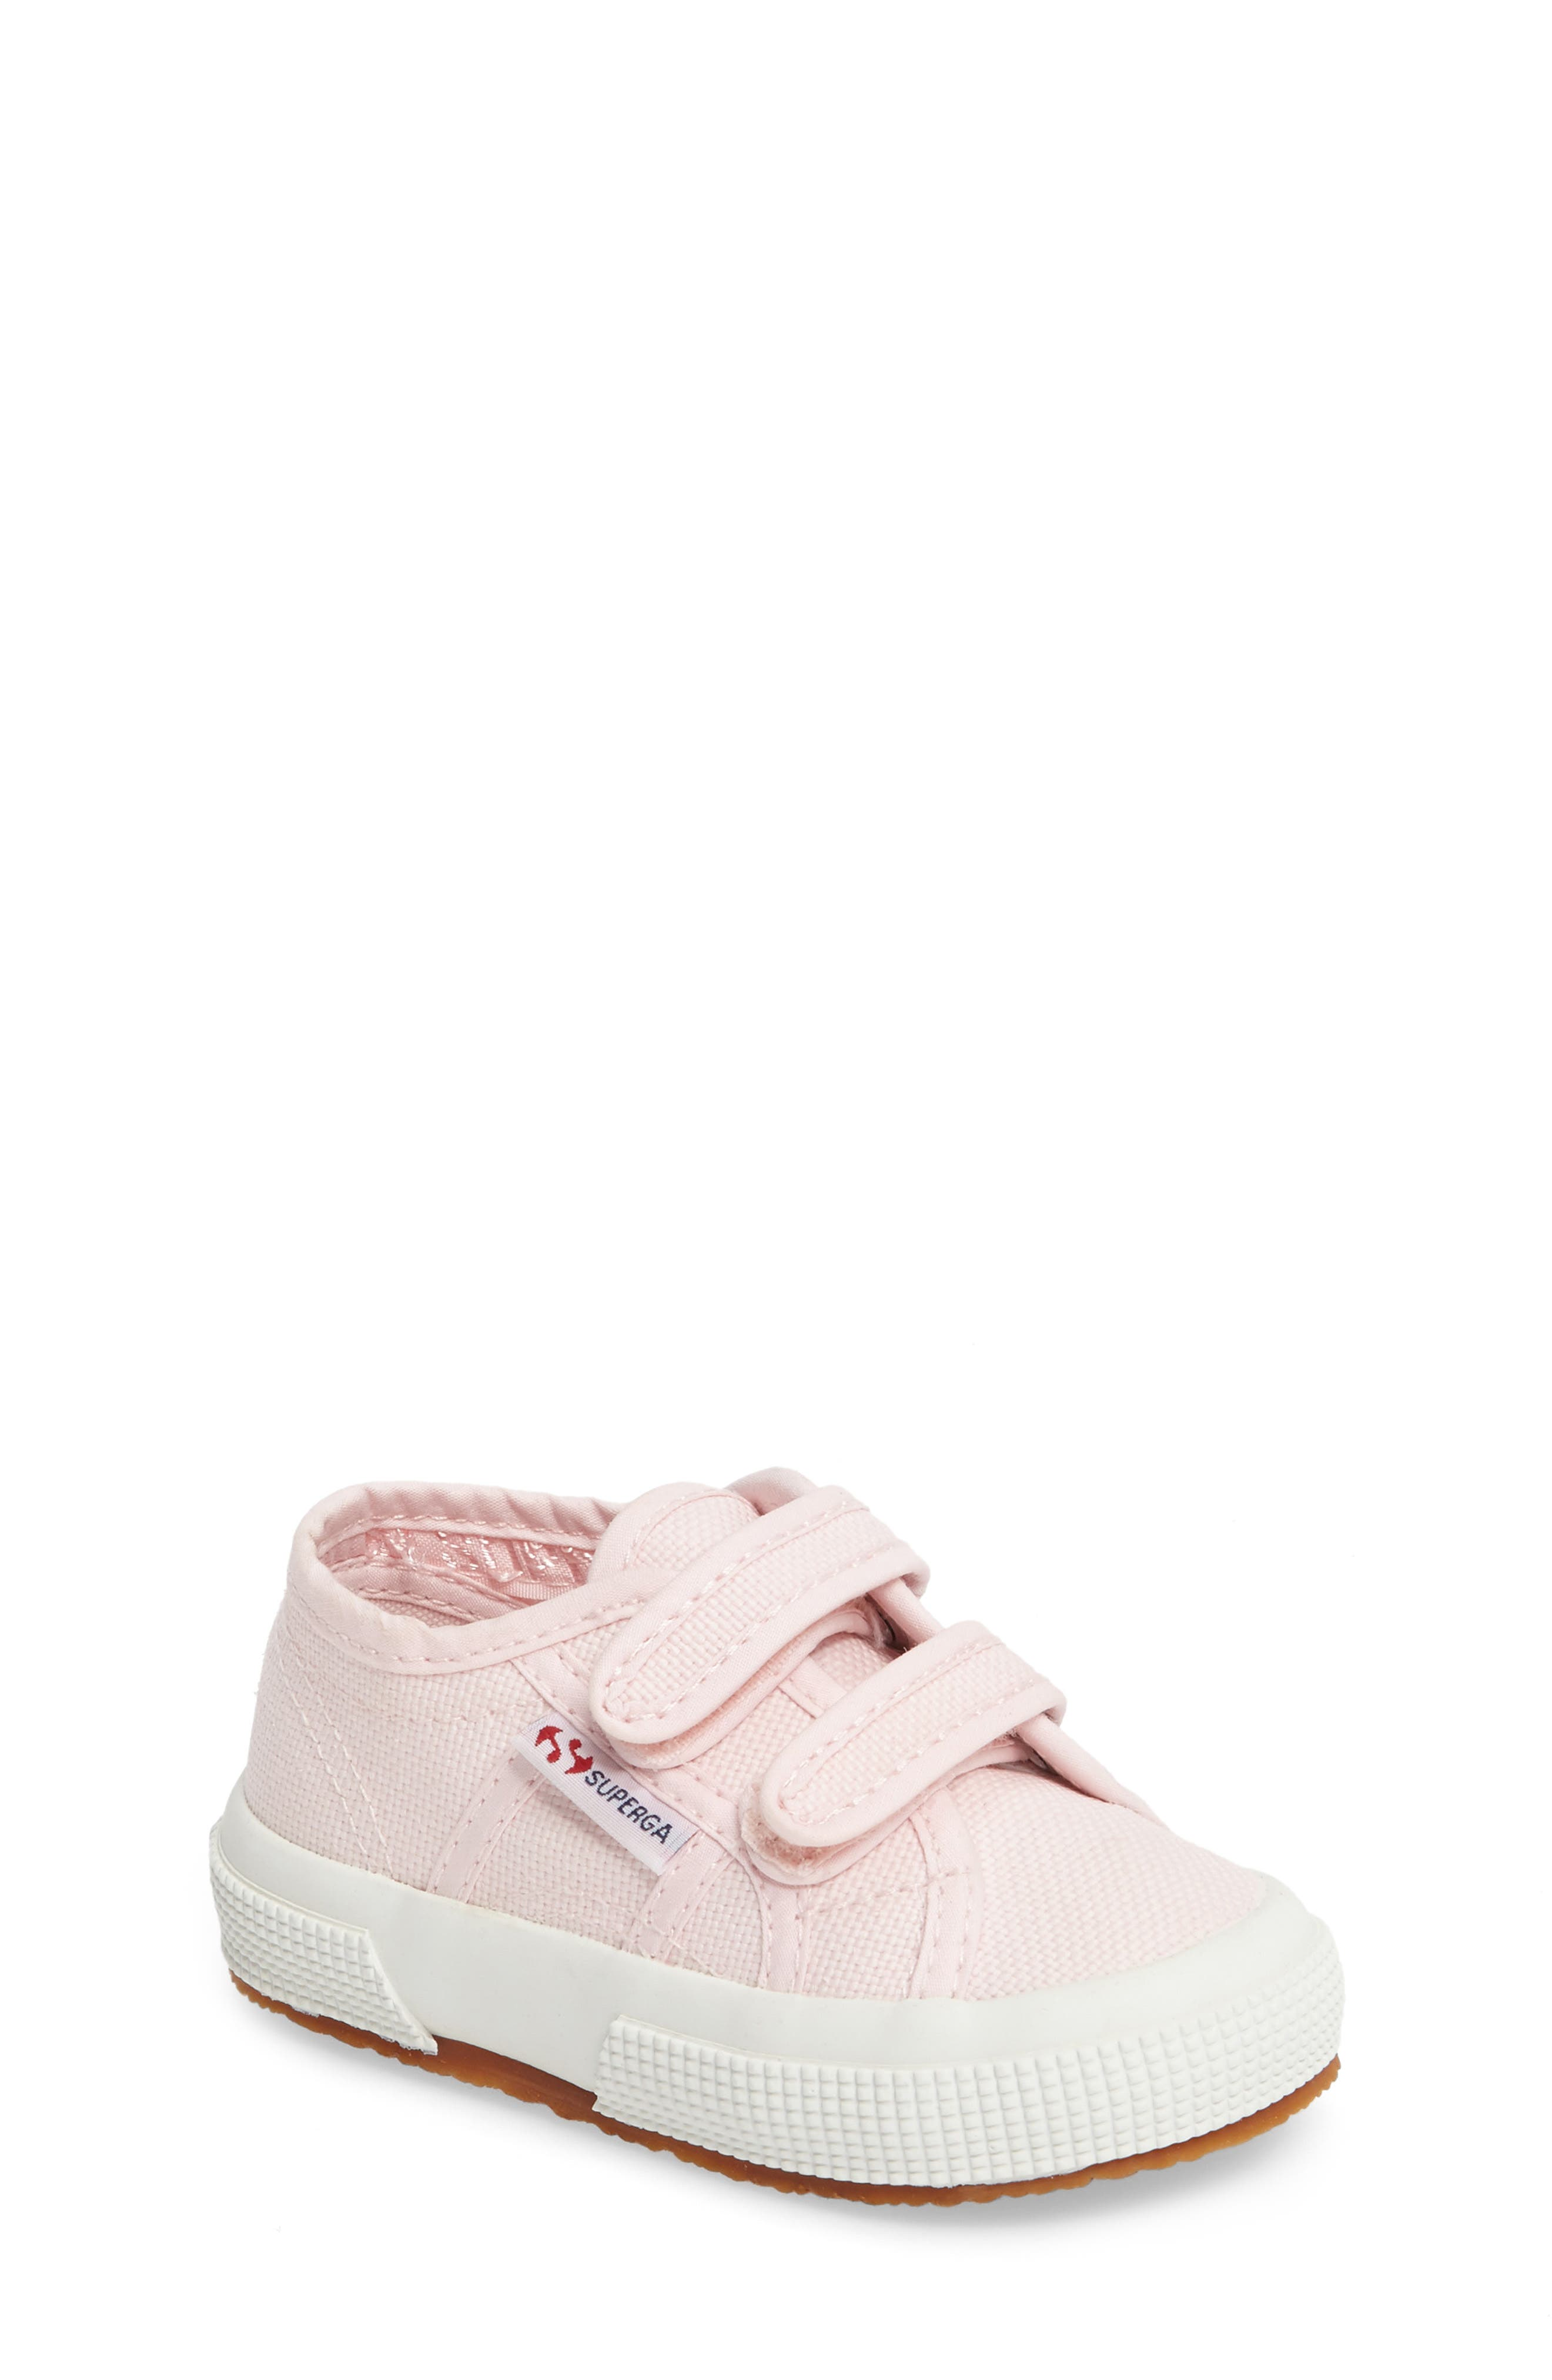 Alternate Image 1 Selected - Superga 'Junior Classic' Sneaker (Toddler & Little Kid)